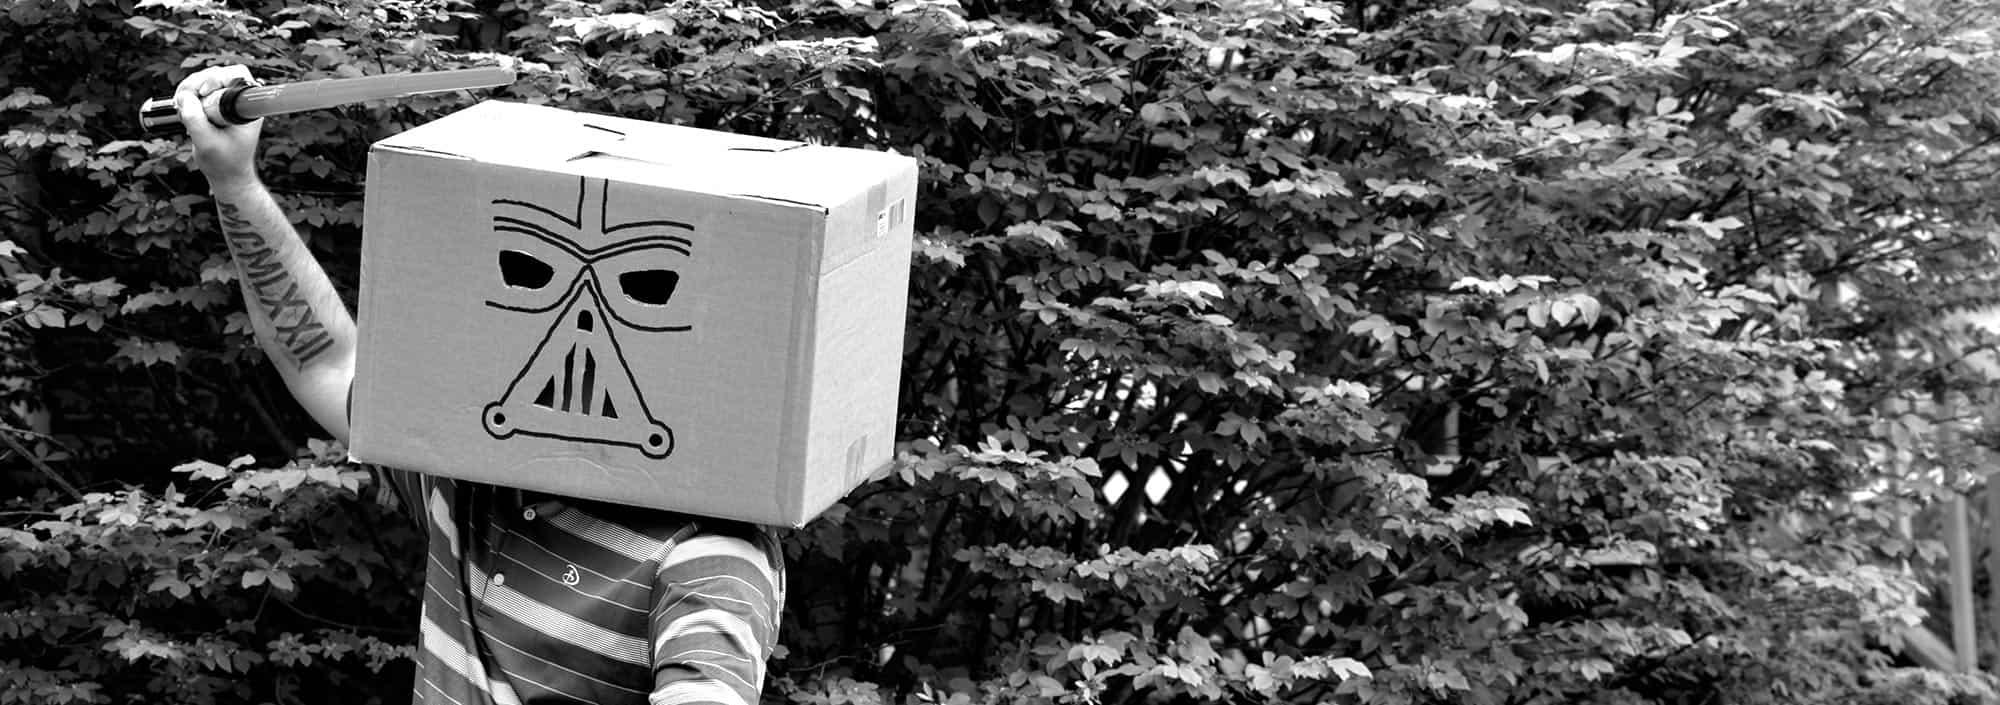 cardboard box on head